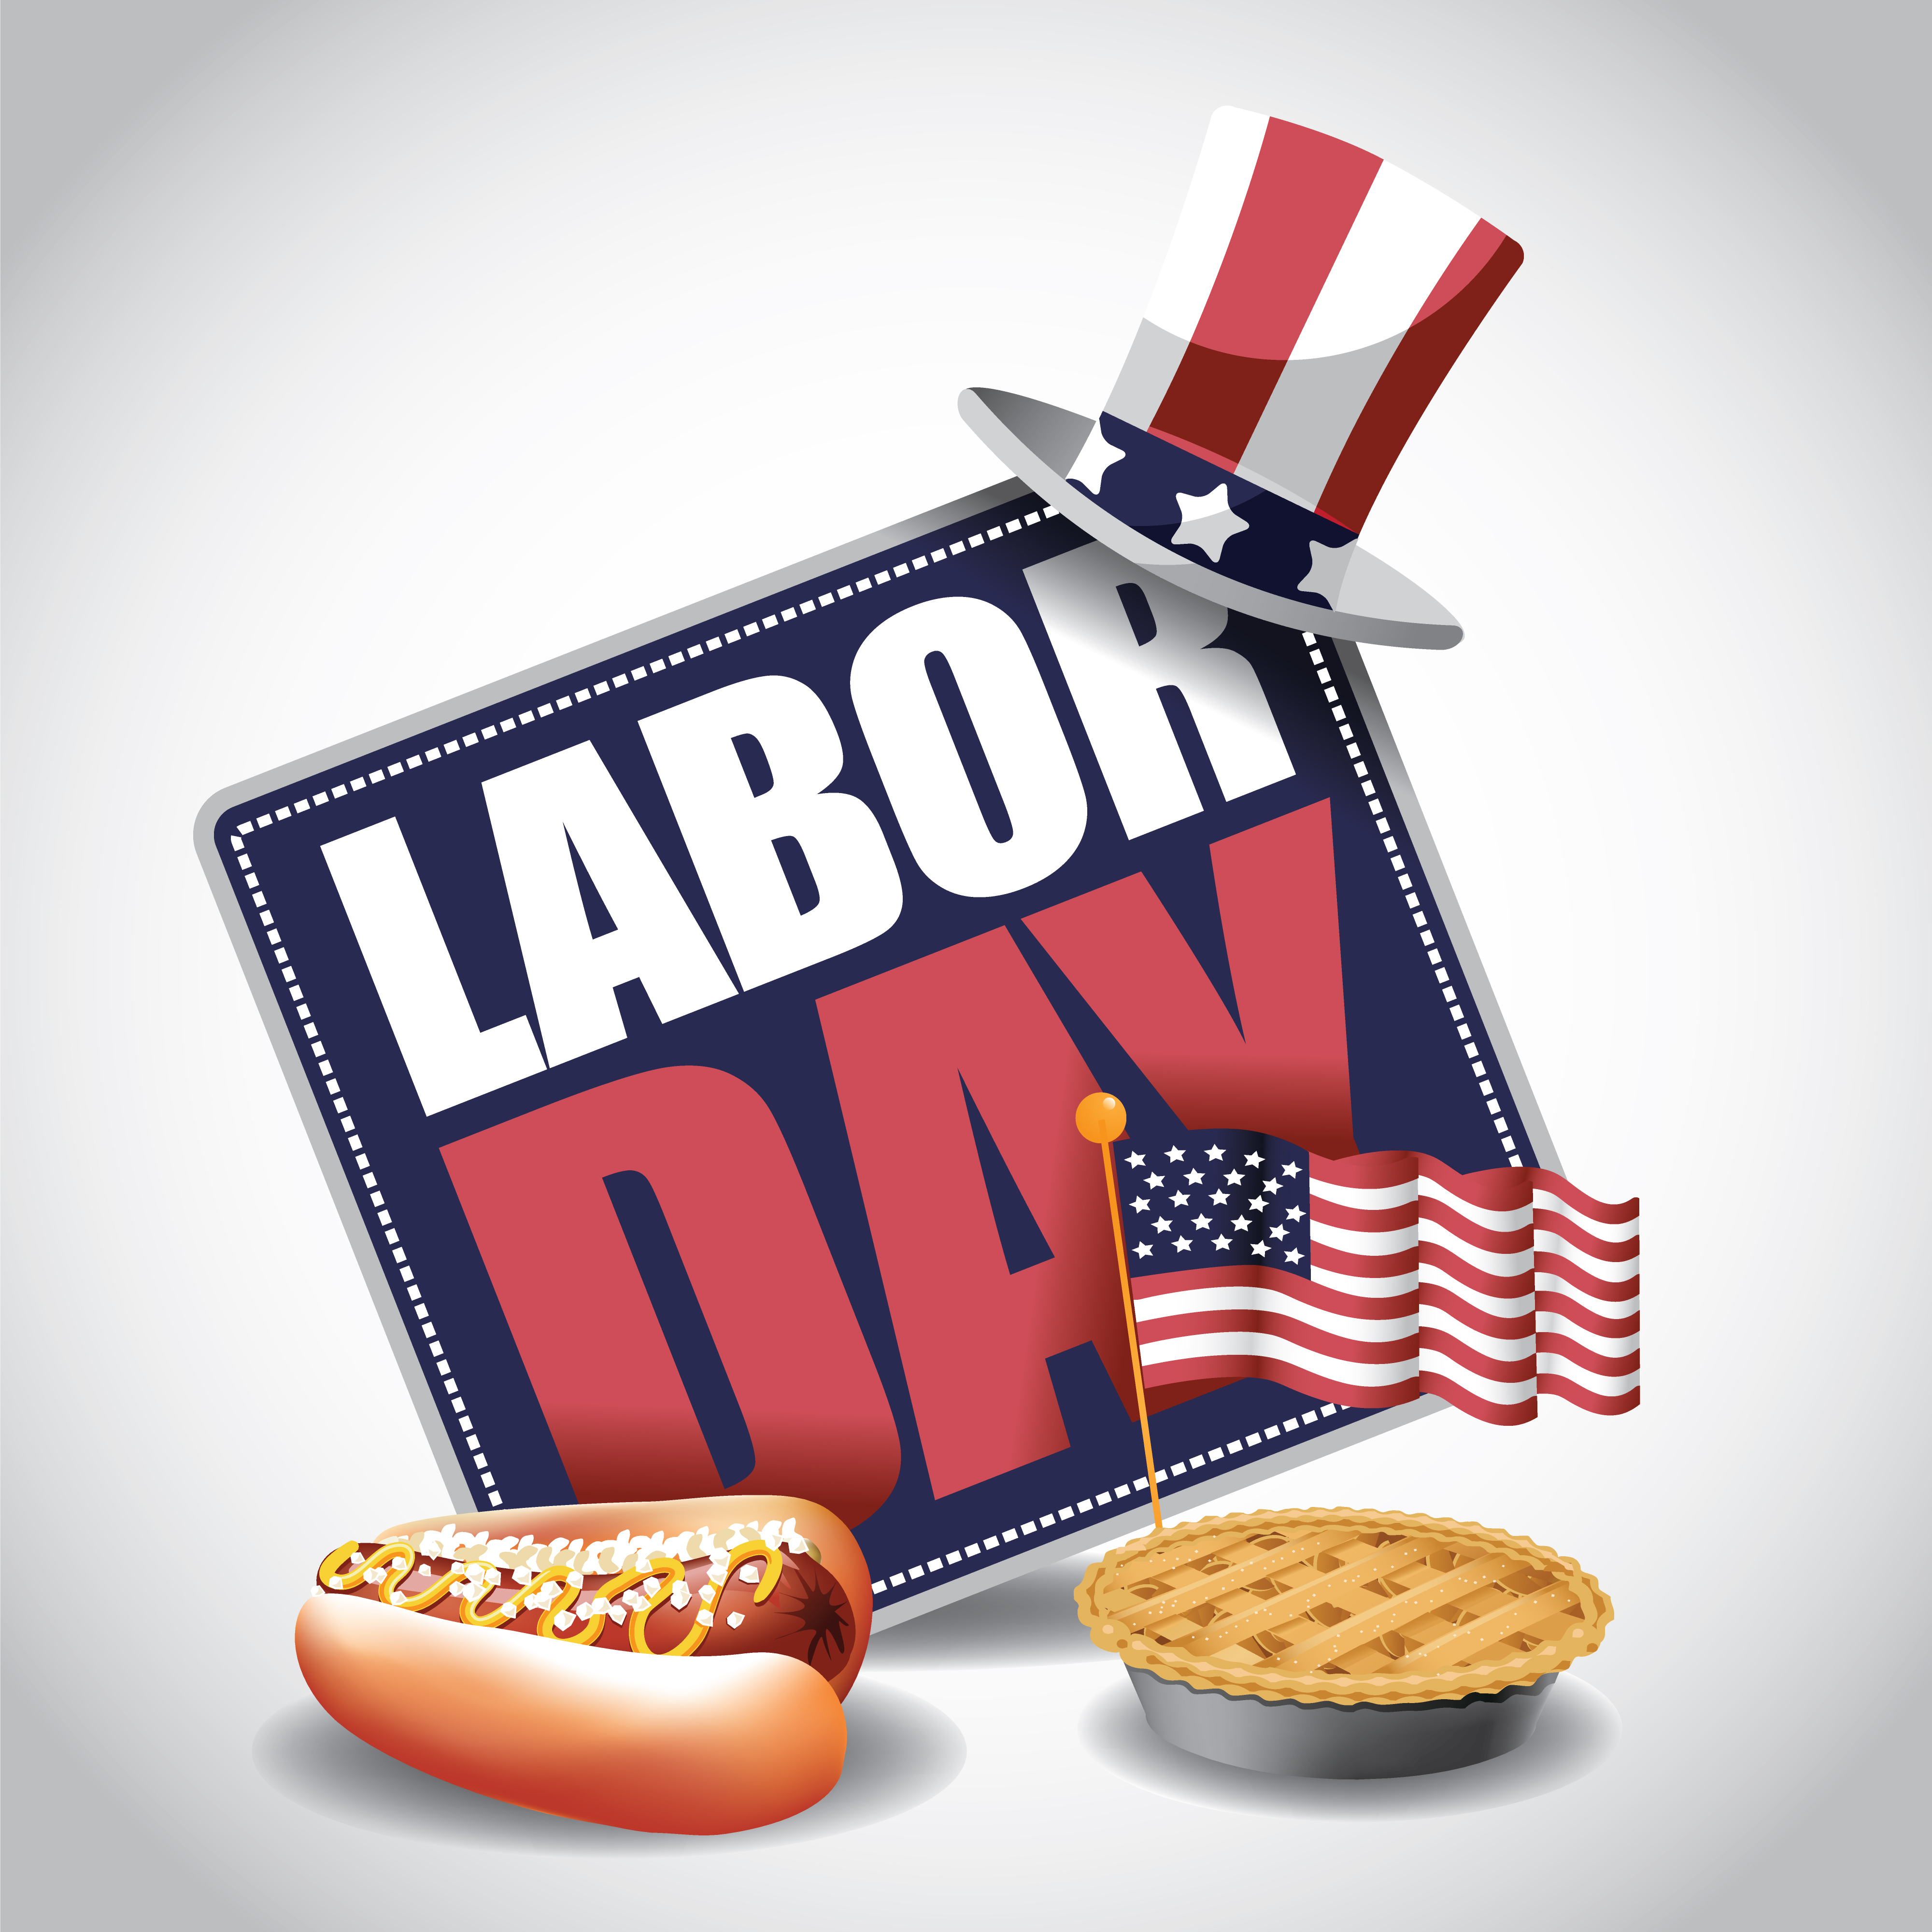 happy-labor-day-wallpaper-wpc580314